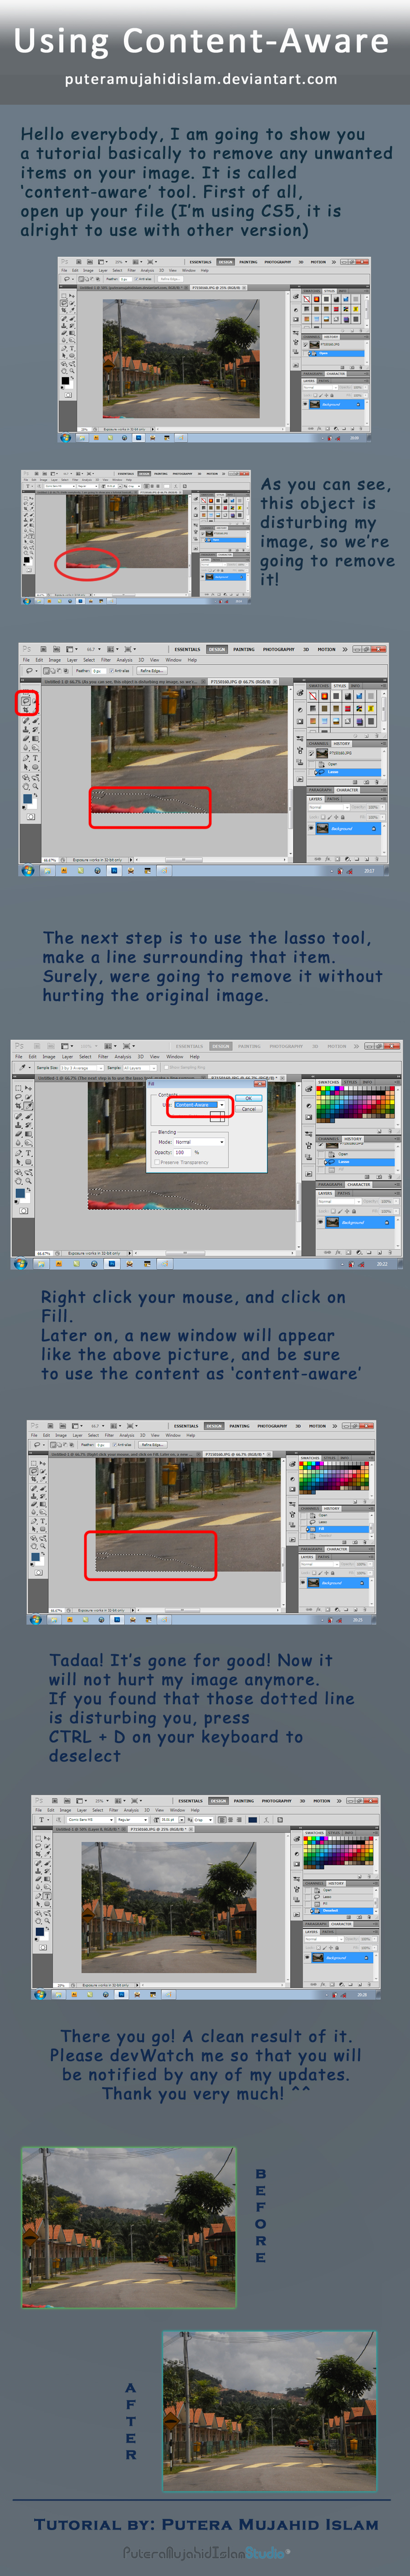 Adobe Photoshop Content-Aware Tutorial by PuteraMujahidIslam